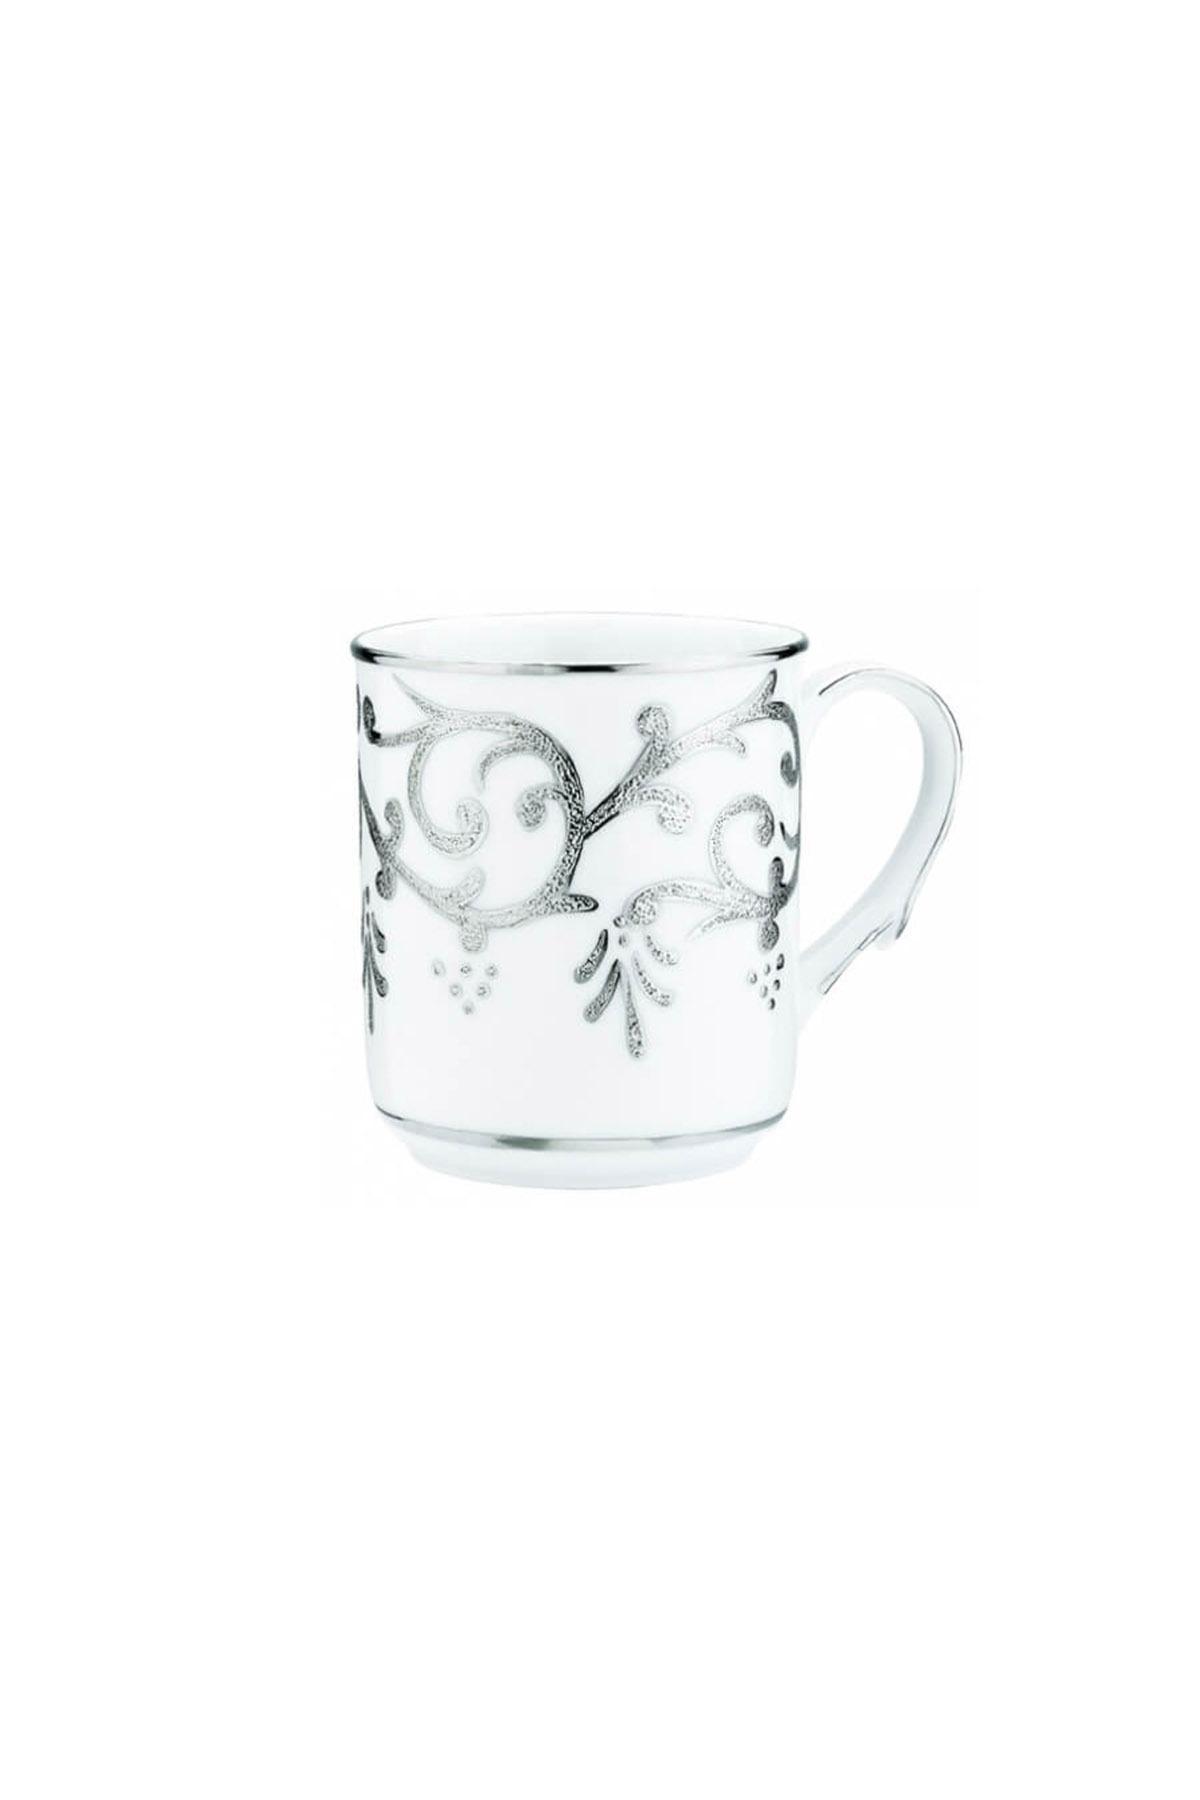 Kütahya Porselen - Kütahya Porselen Mug Bardak 3678